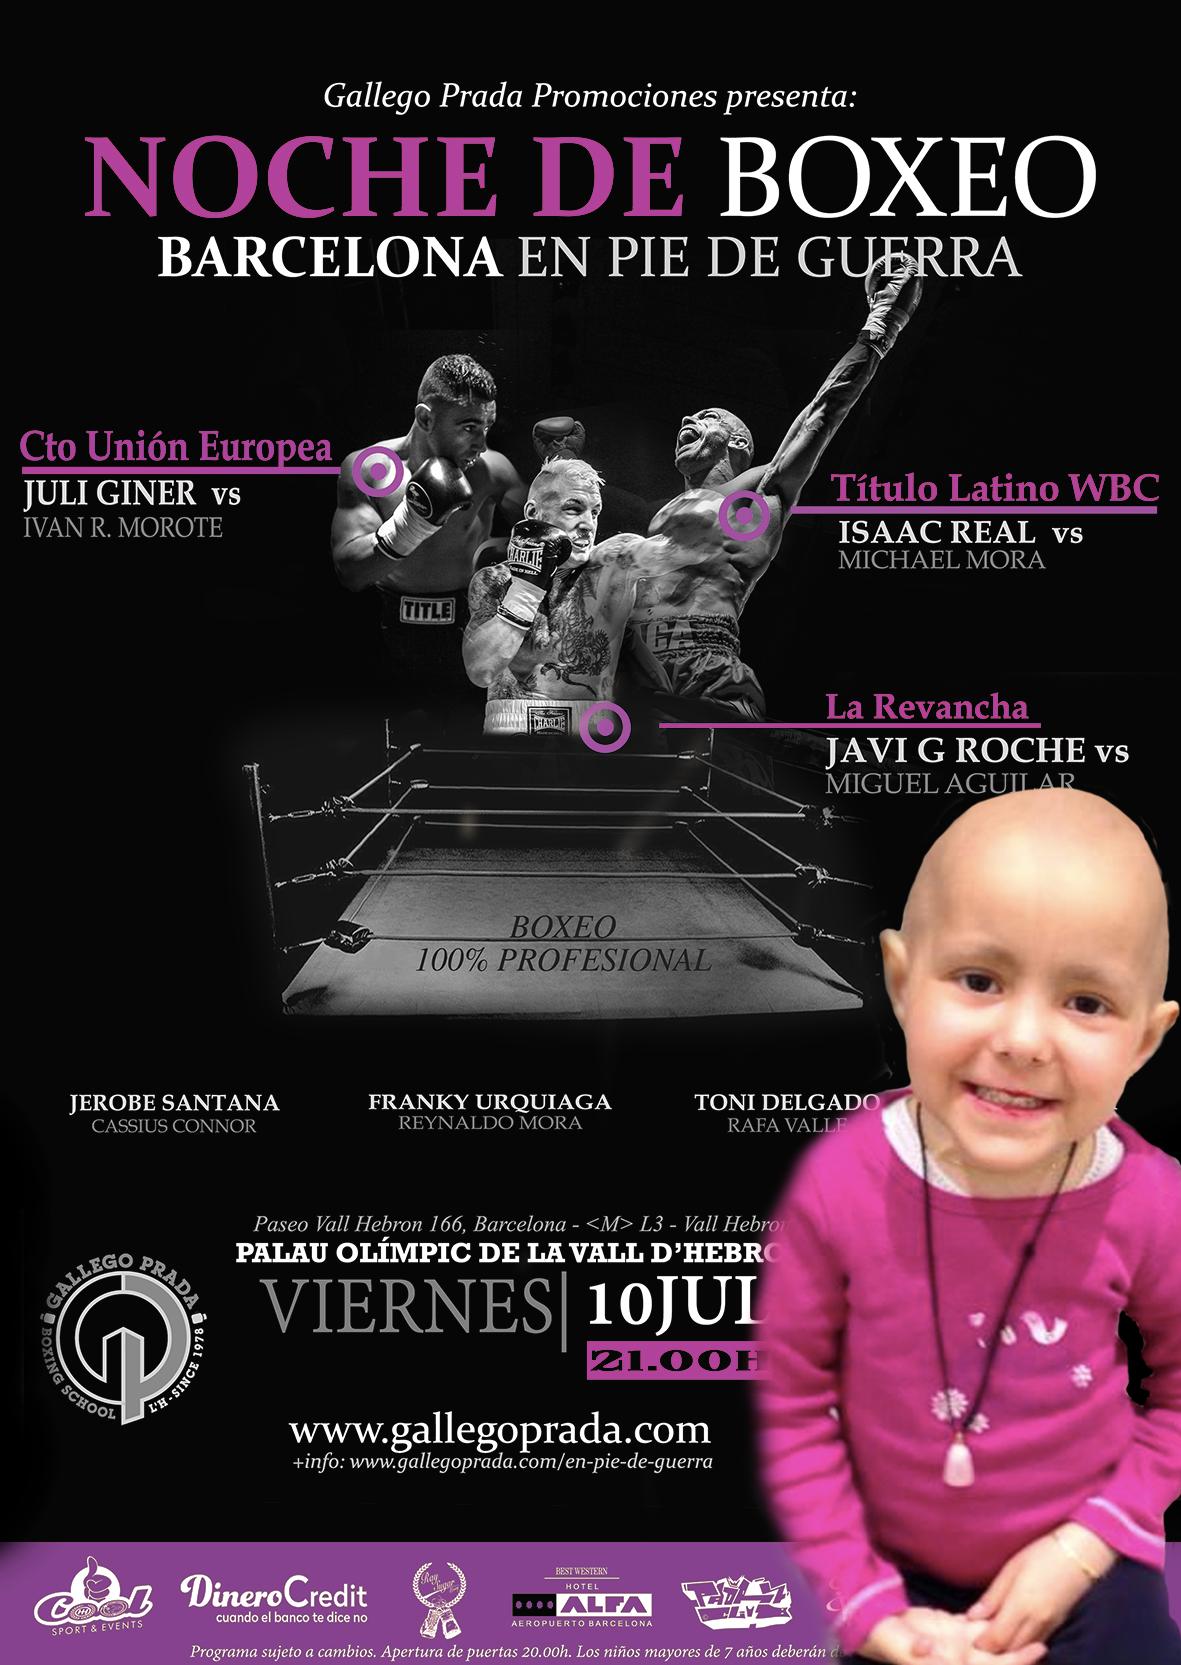 Gallego Prada contra el cáncer infantil